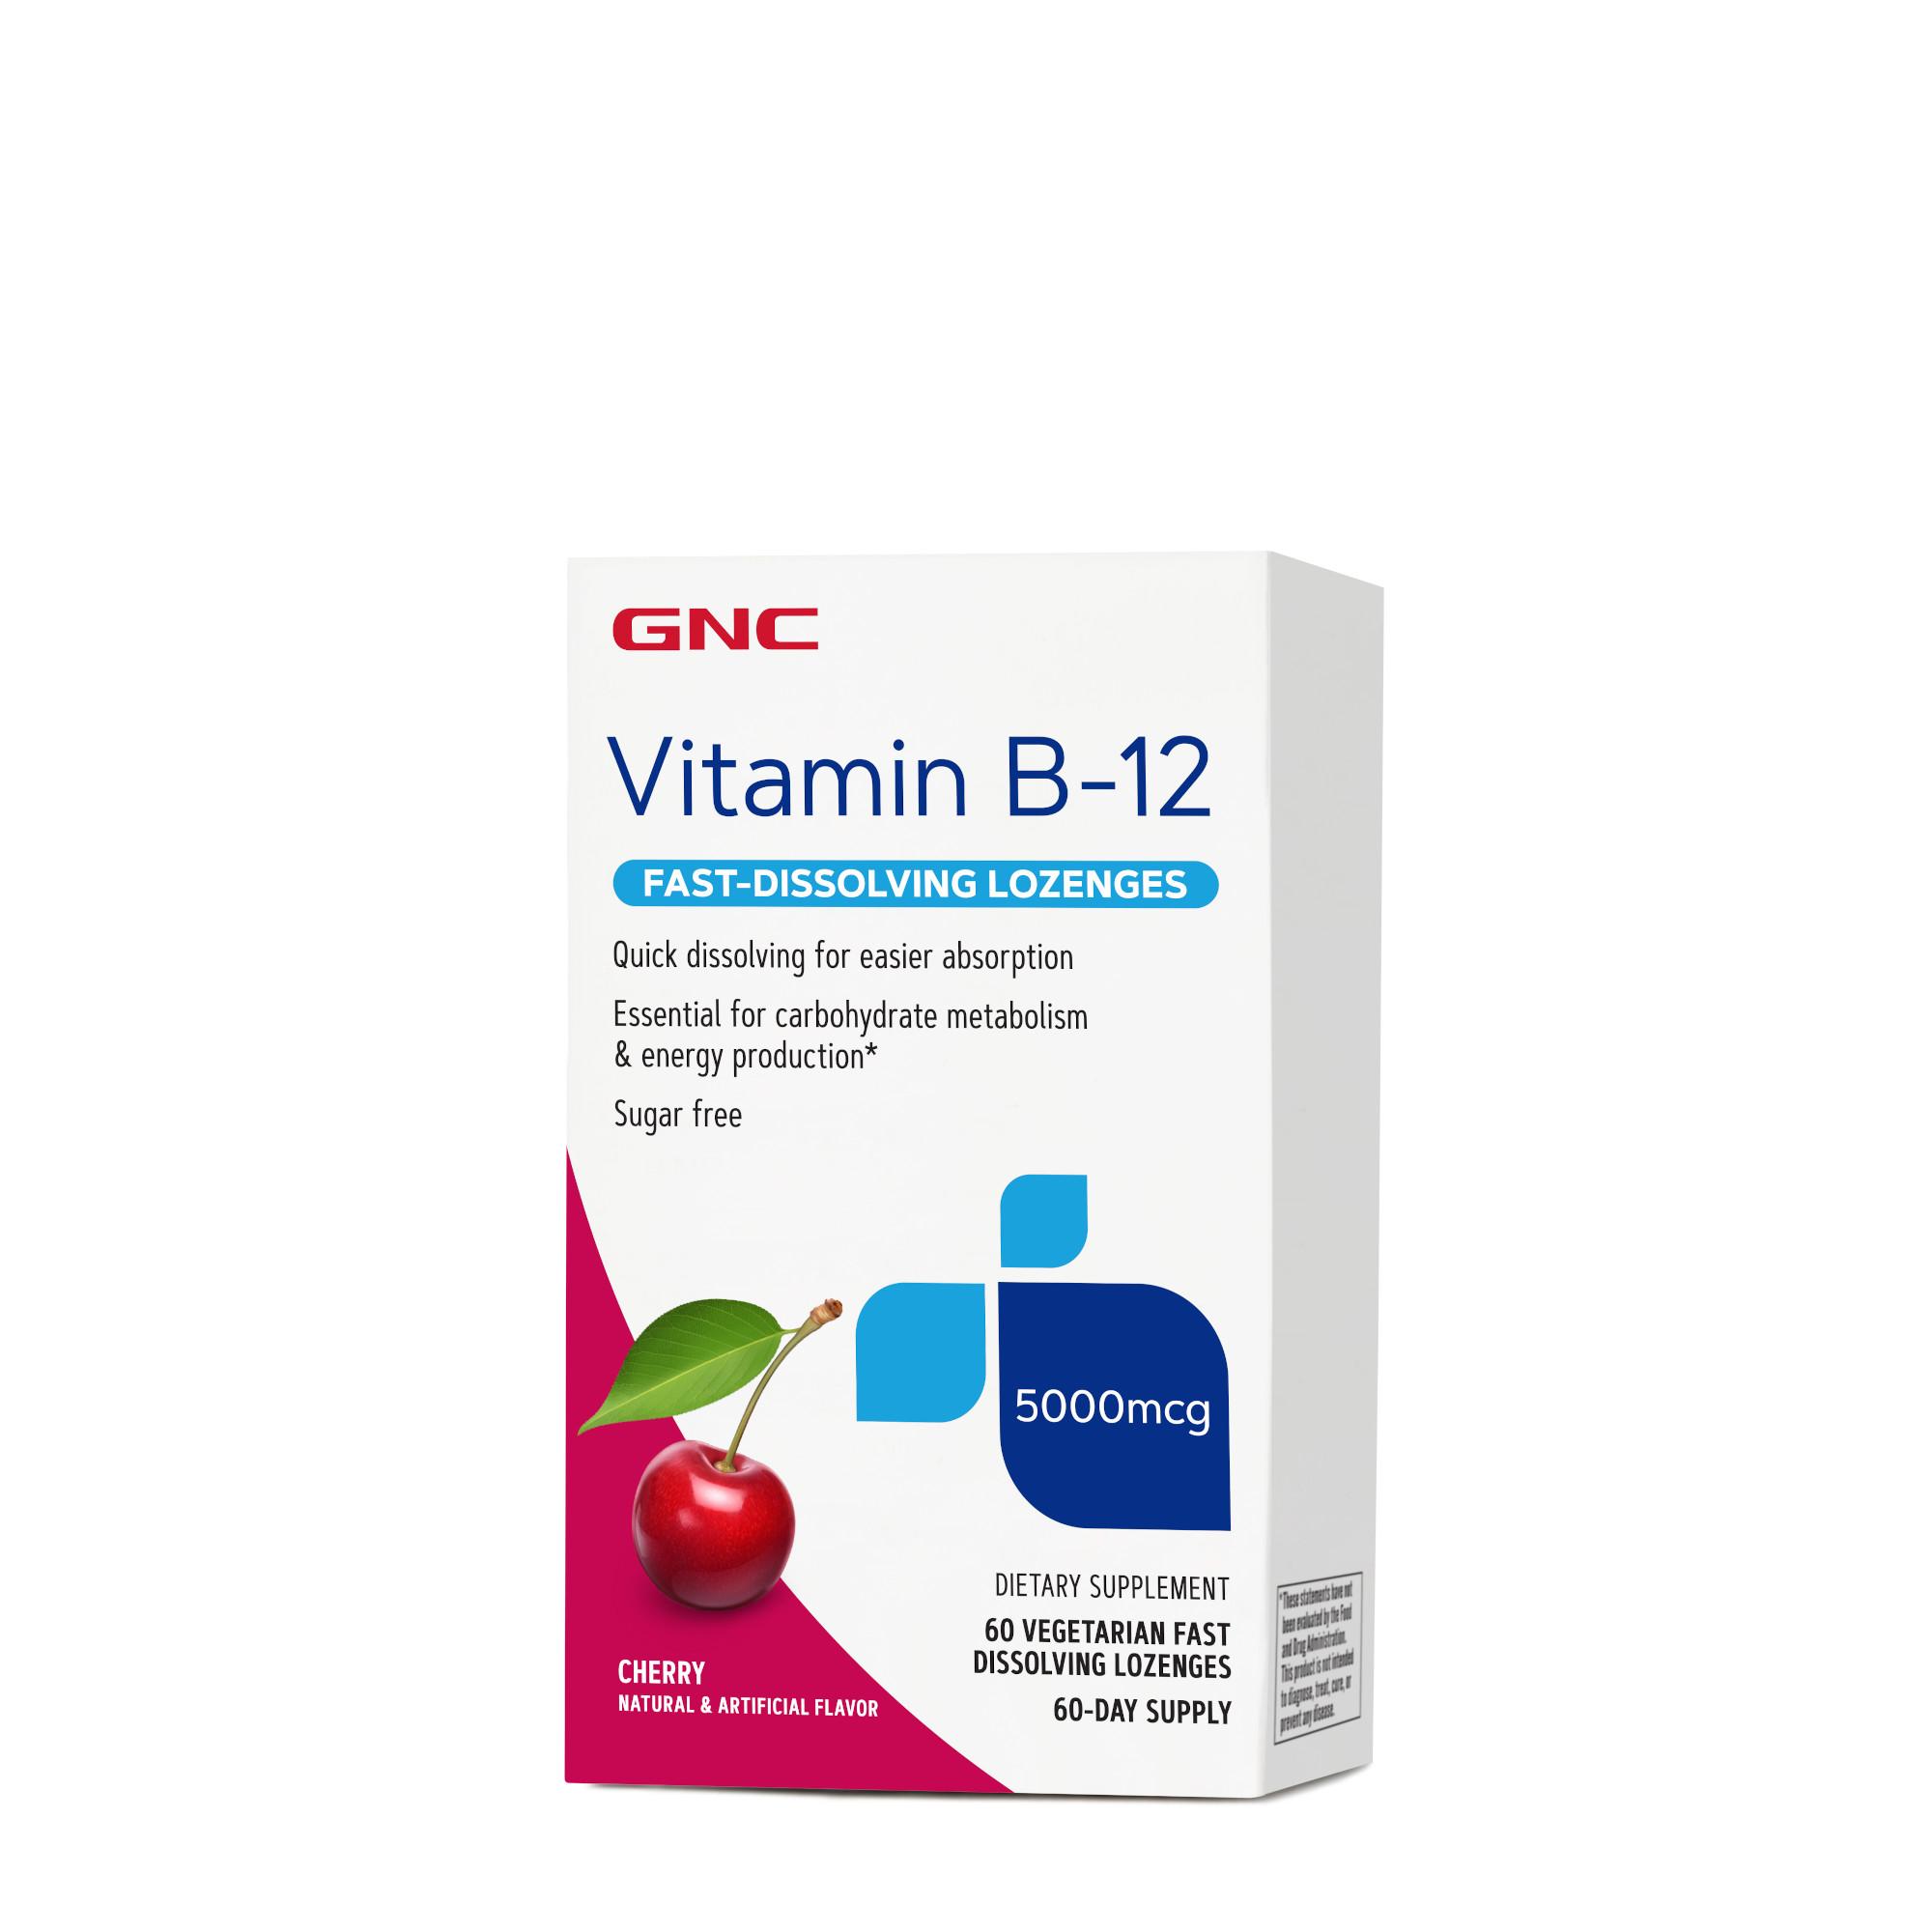 GNC Vitamin B-12 5000 mcg - Cherry   GNC